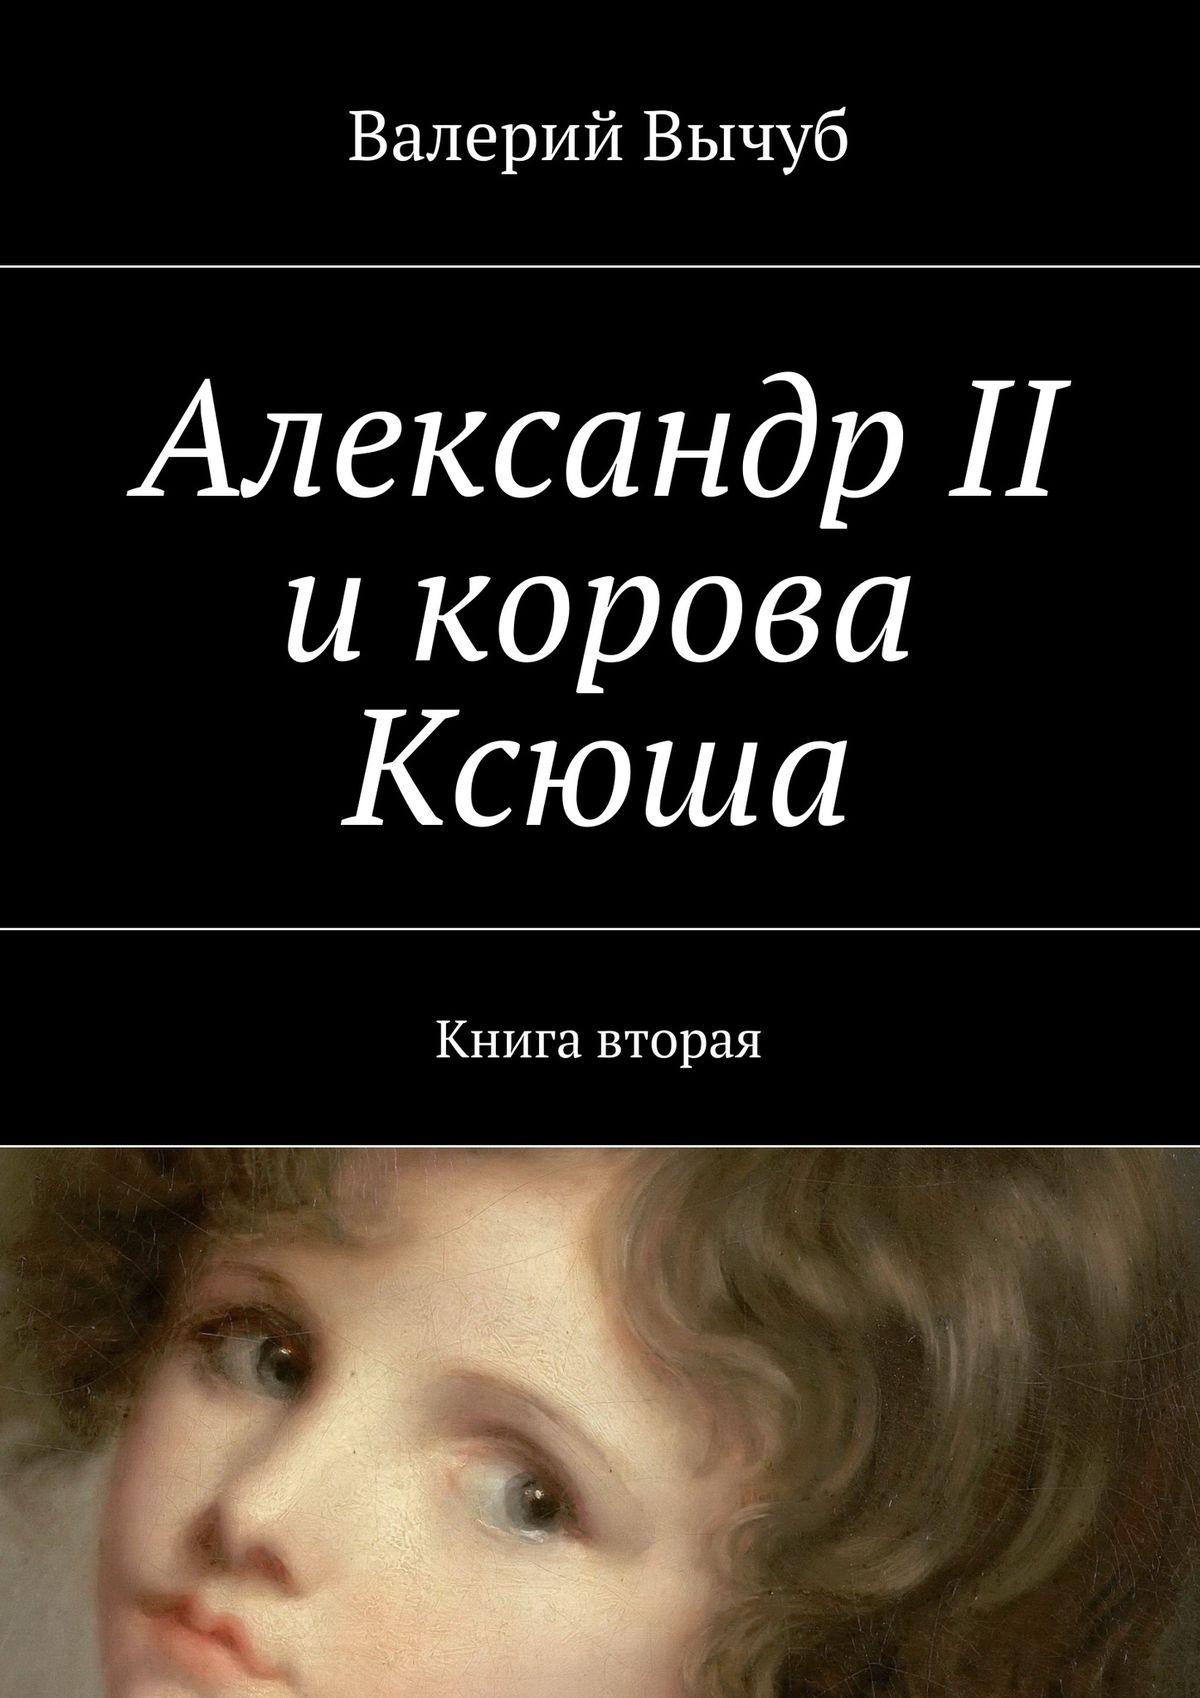 Валерий Вычуб Александр II икорова Ксюша. Книга вторая цены онлайн